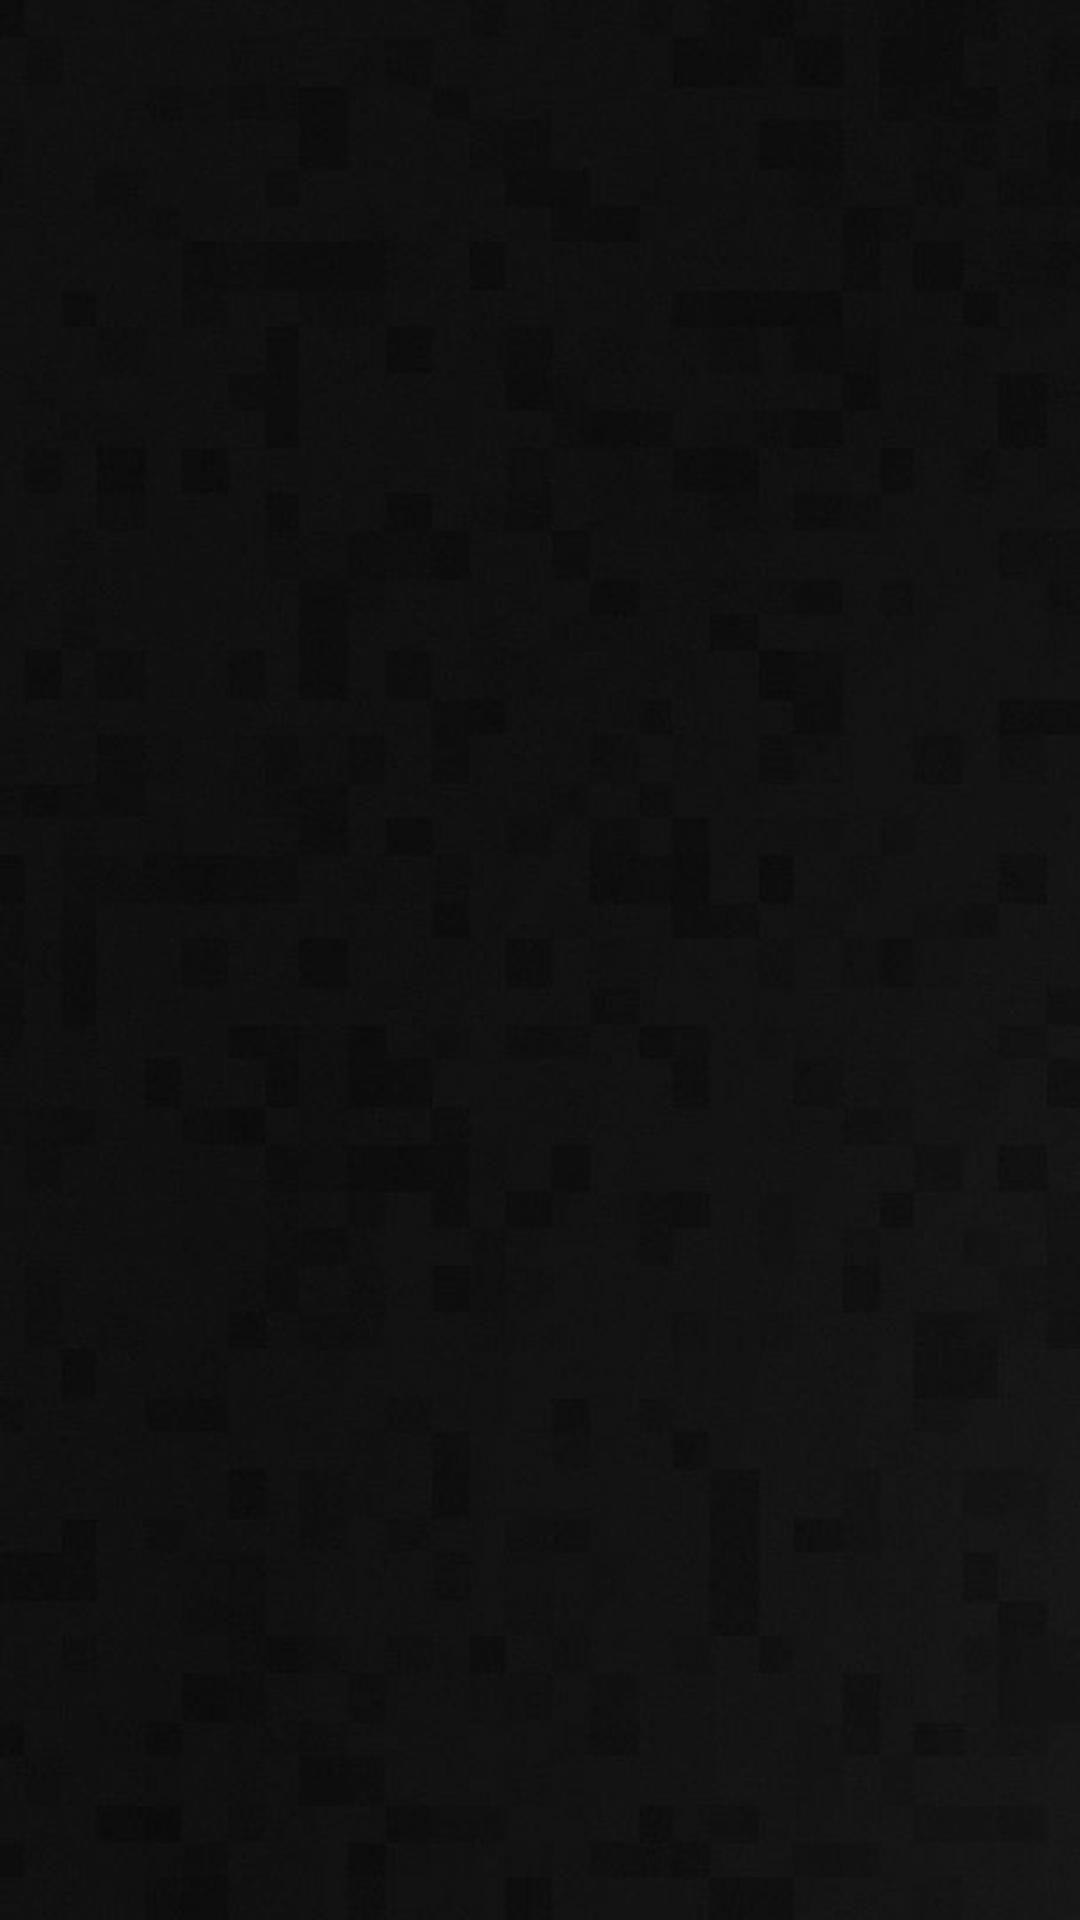 android htc sensation x black wallpapers hd desktop